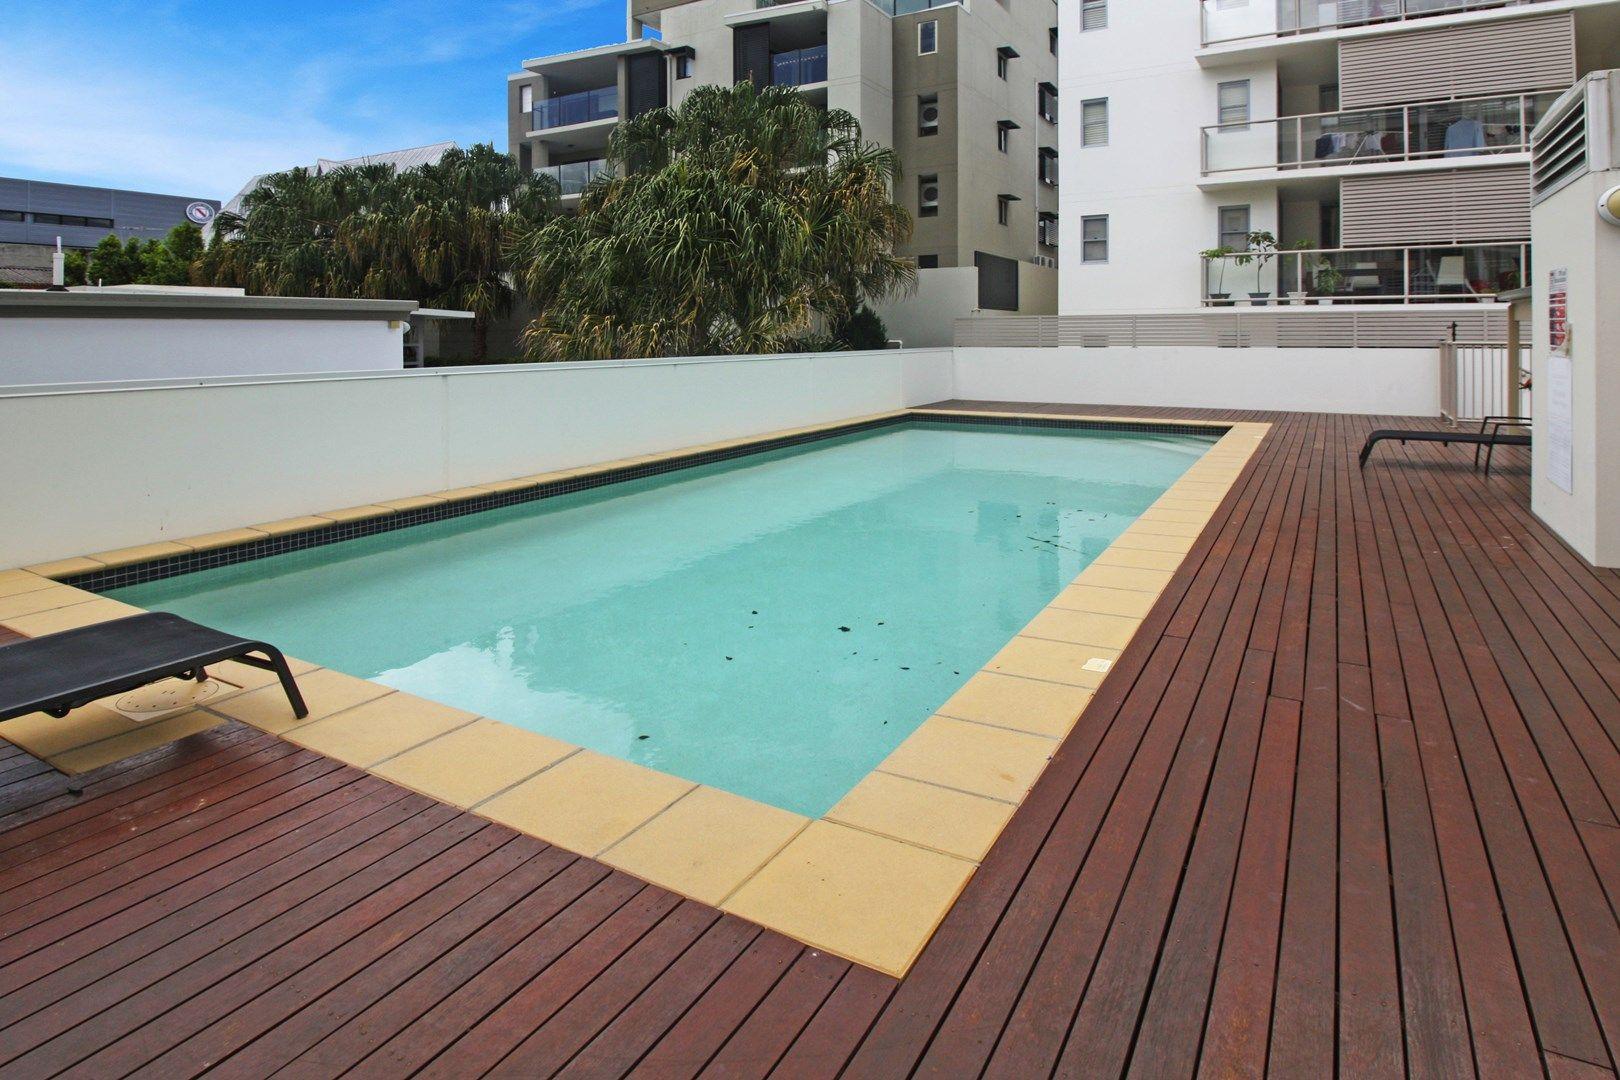 27/72 Merivale Street, South Brisbane QLD 4101, Image 0